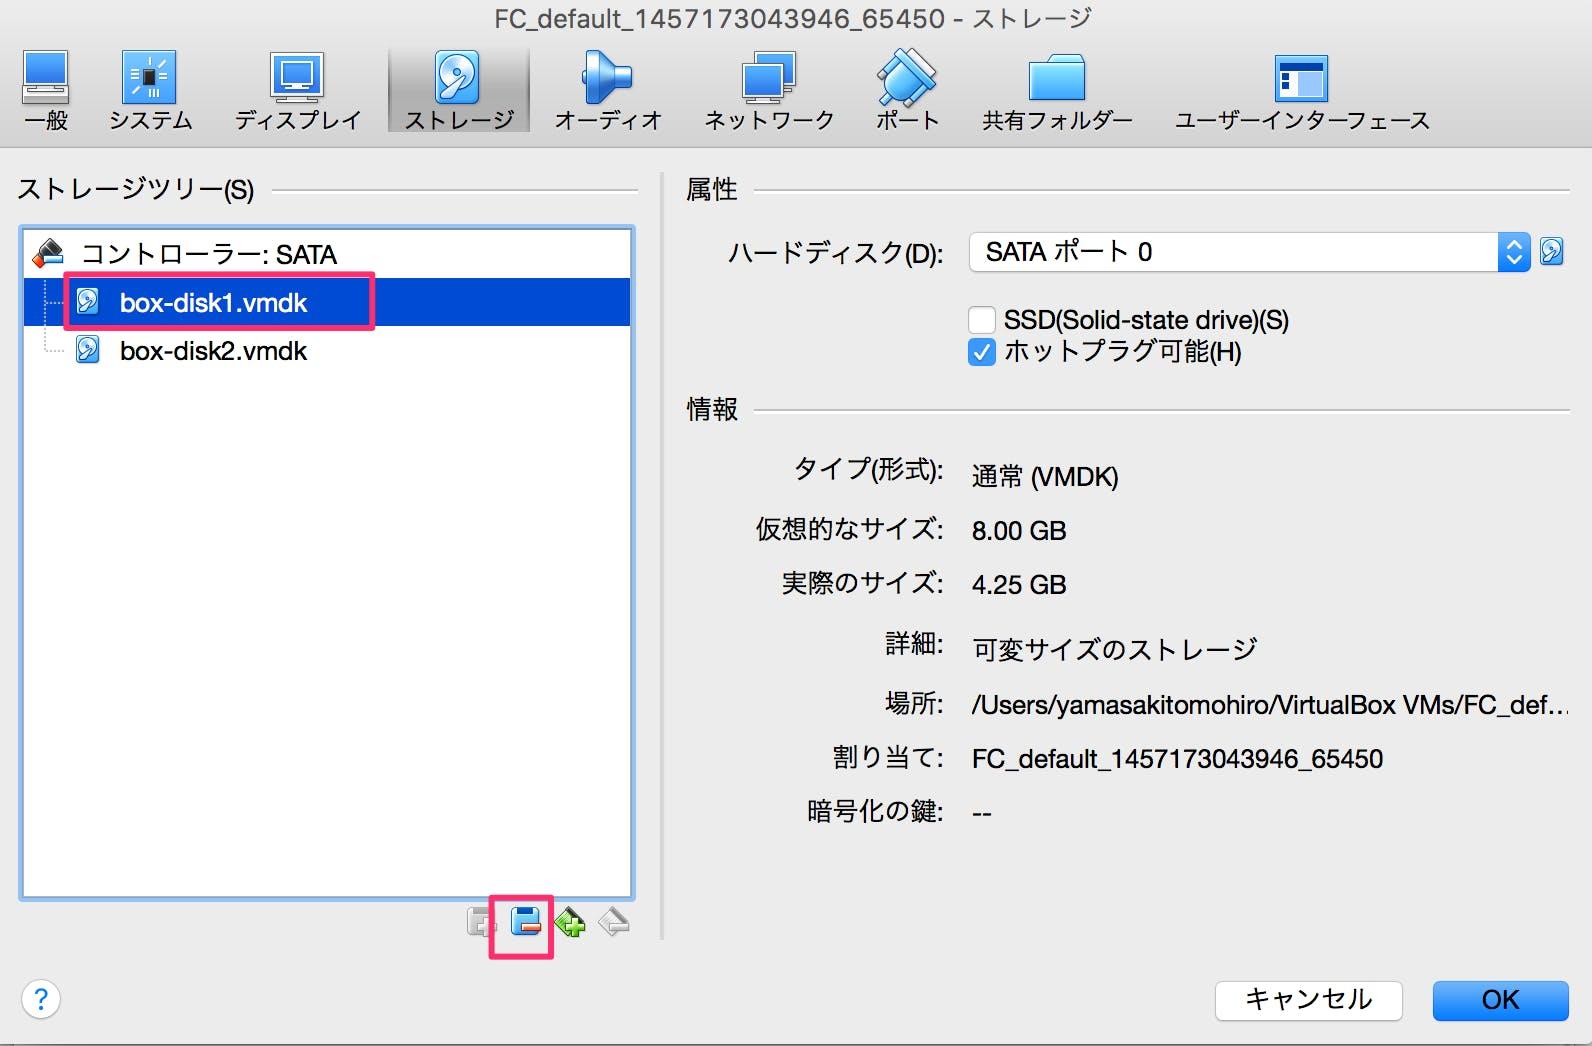 FC_default_1457173043946_65450_-_ストレージ_と_Oracle_VM_VirtualBox_マネージャー_と_Kobito.png